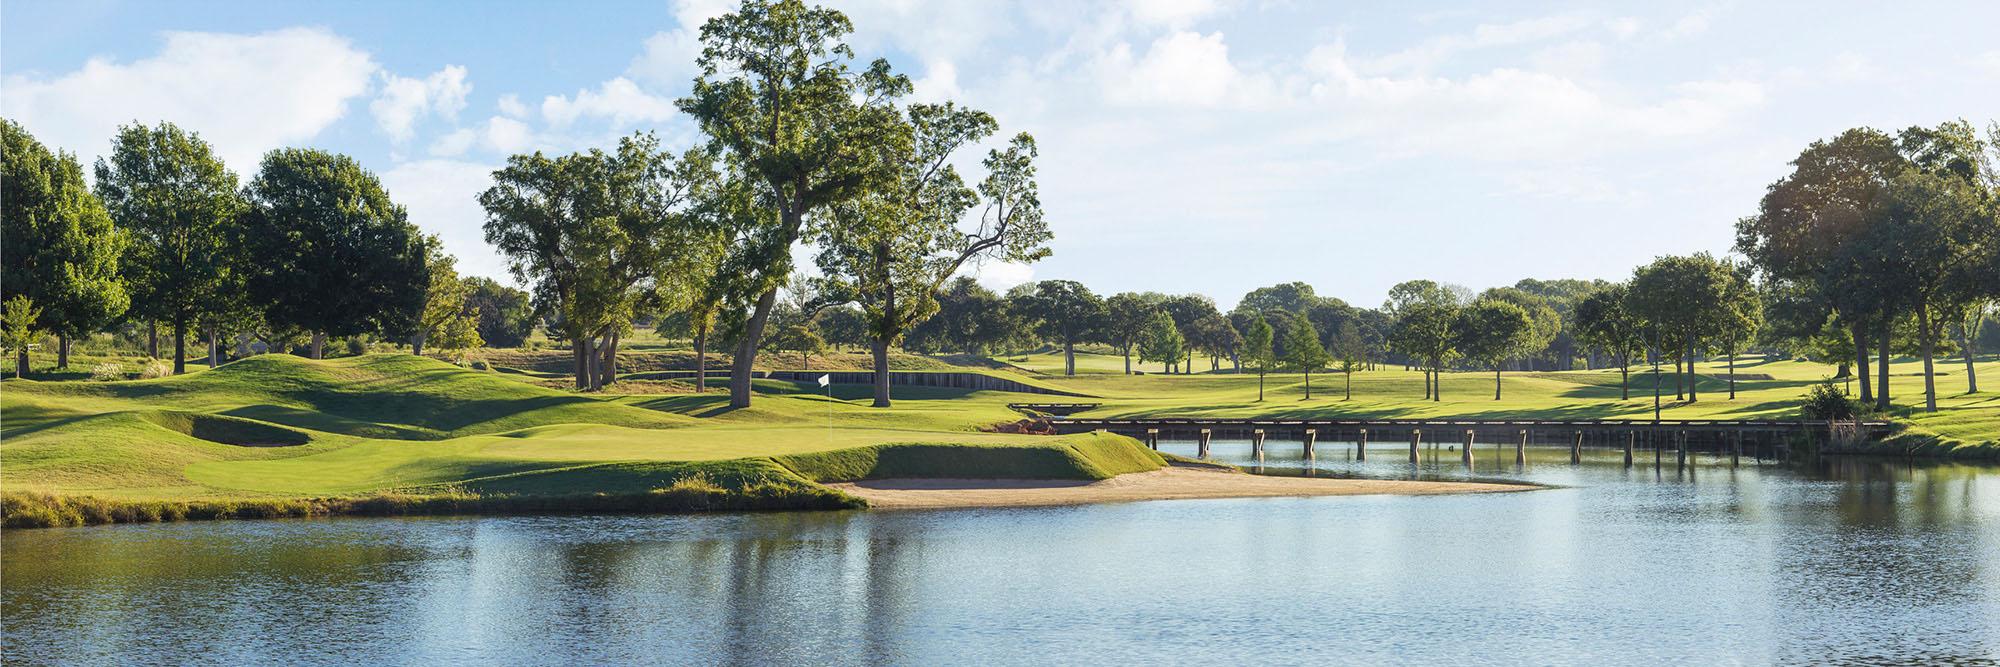 Golf Course Image - Oak Tree National No. 17